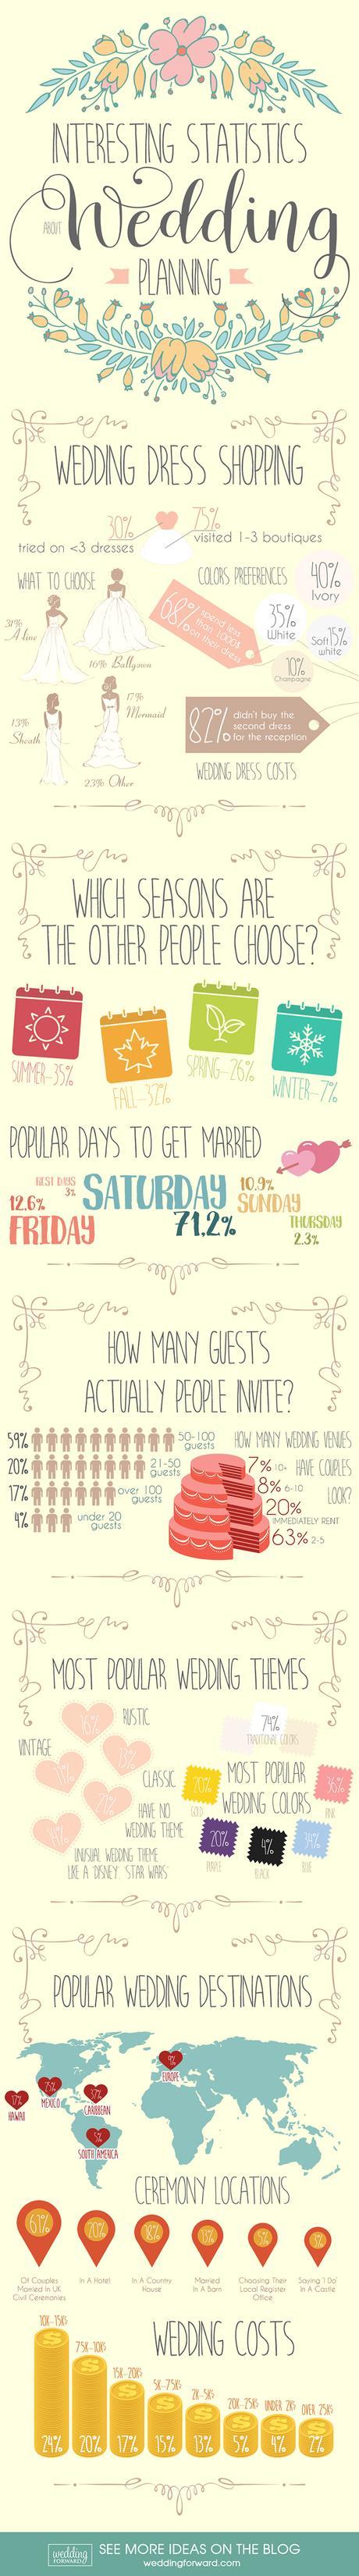 wedding trivia interesting facts statistics infographic